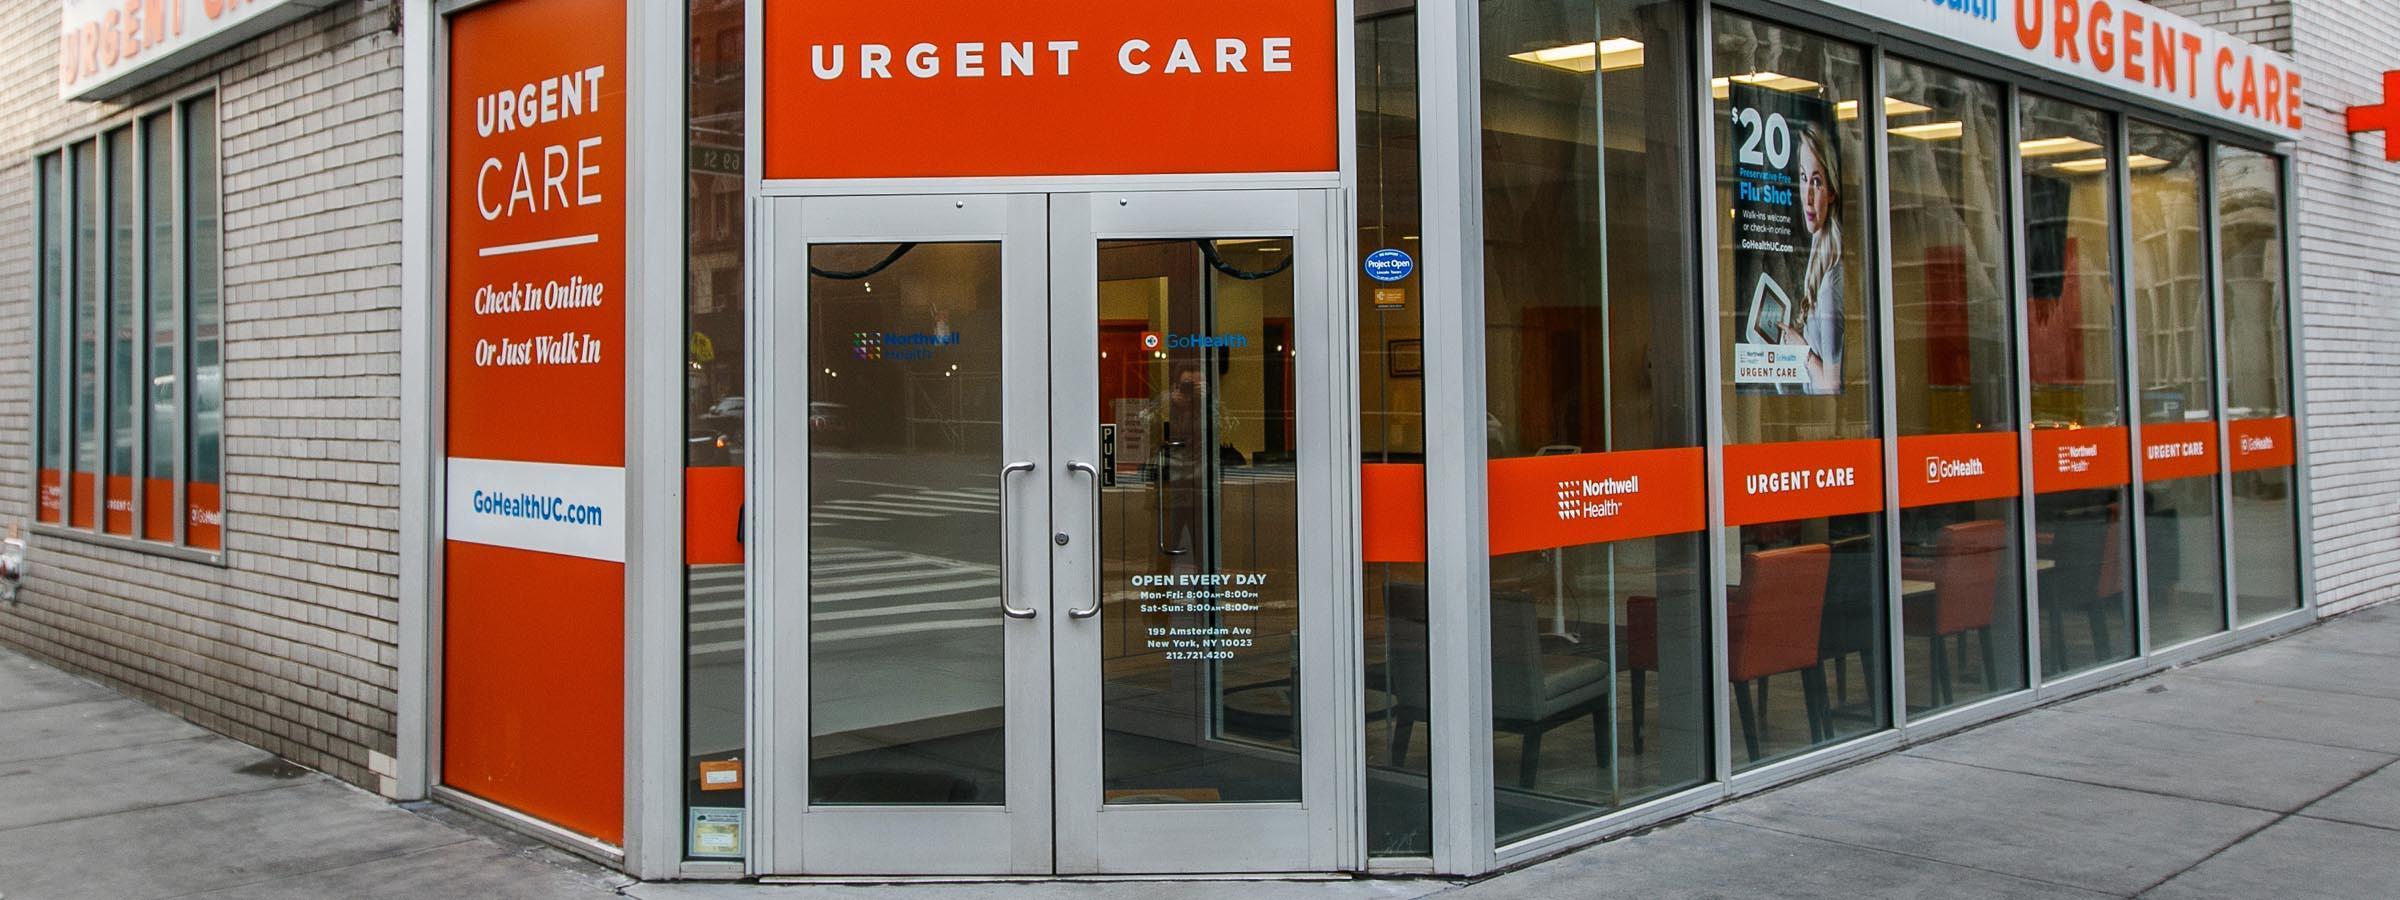 Urgent care storefront.